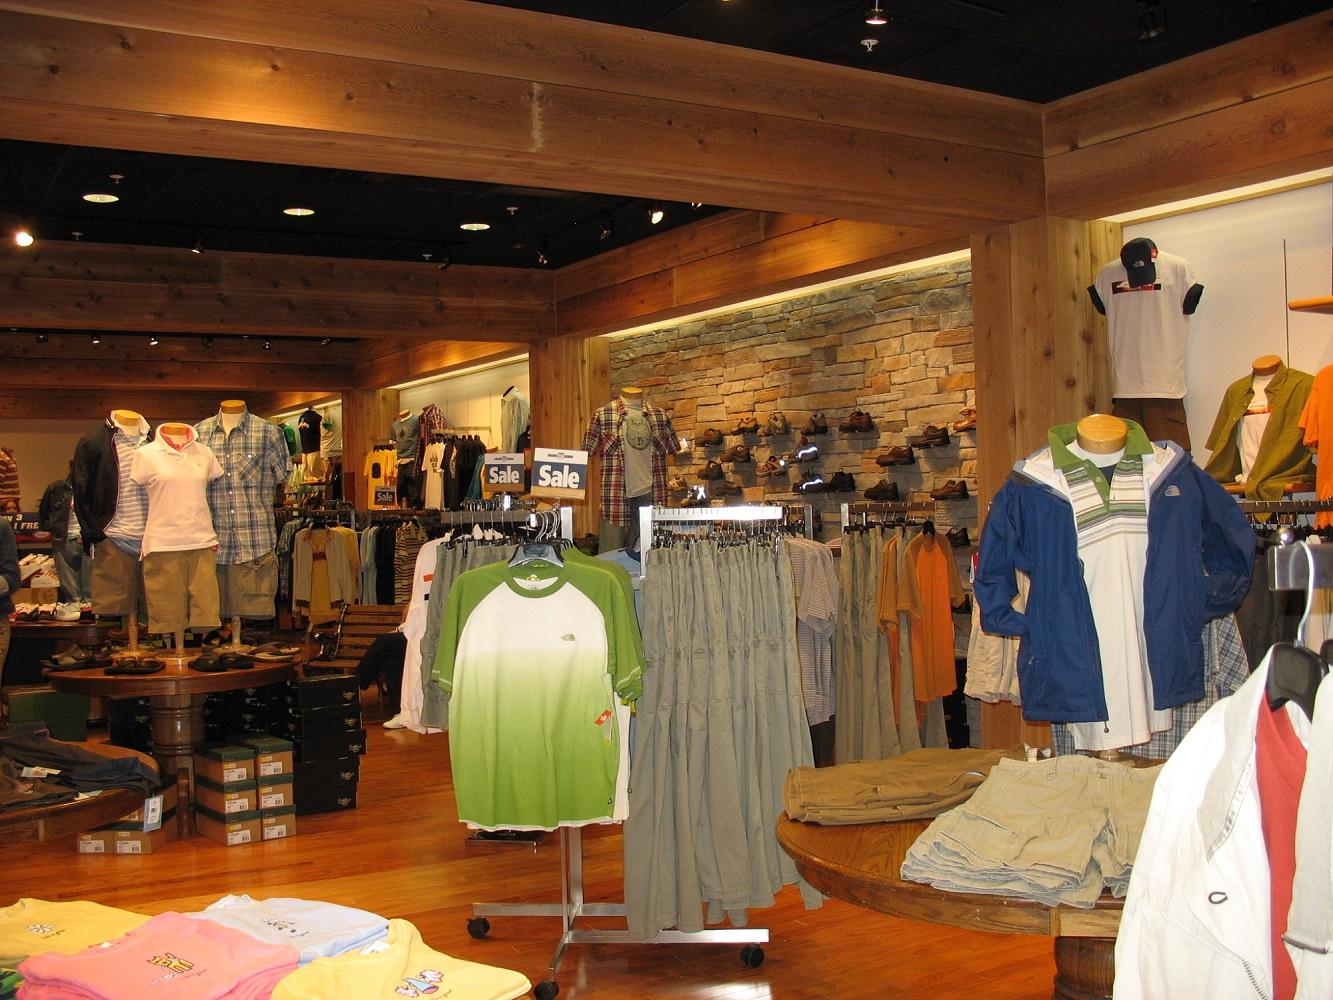 Interior Clothes Rack Area.jpg